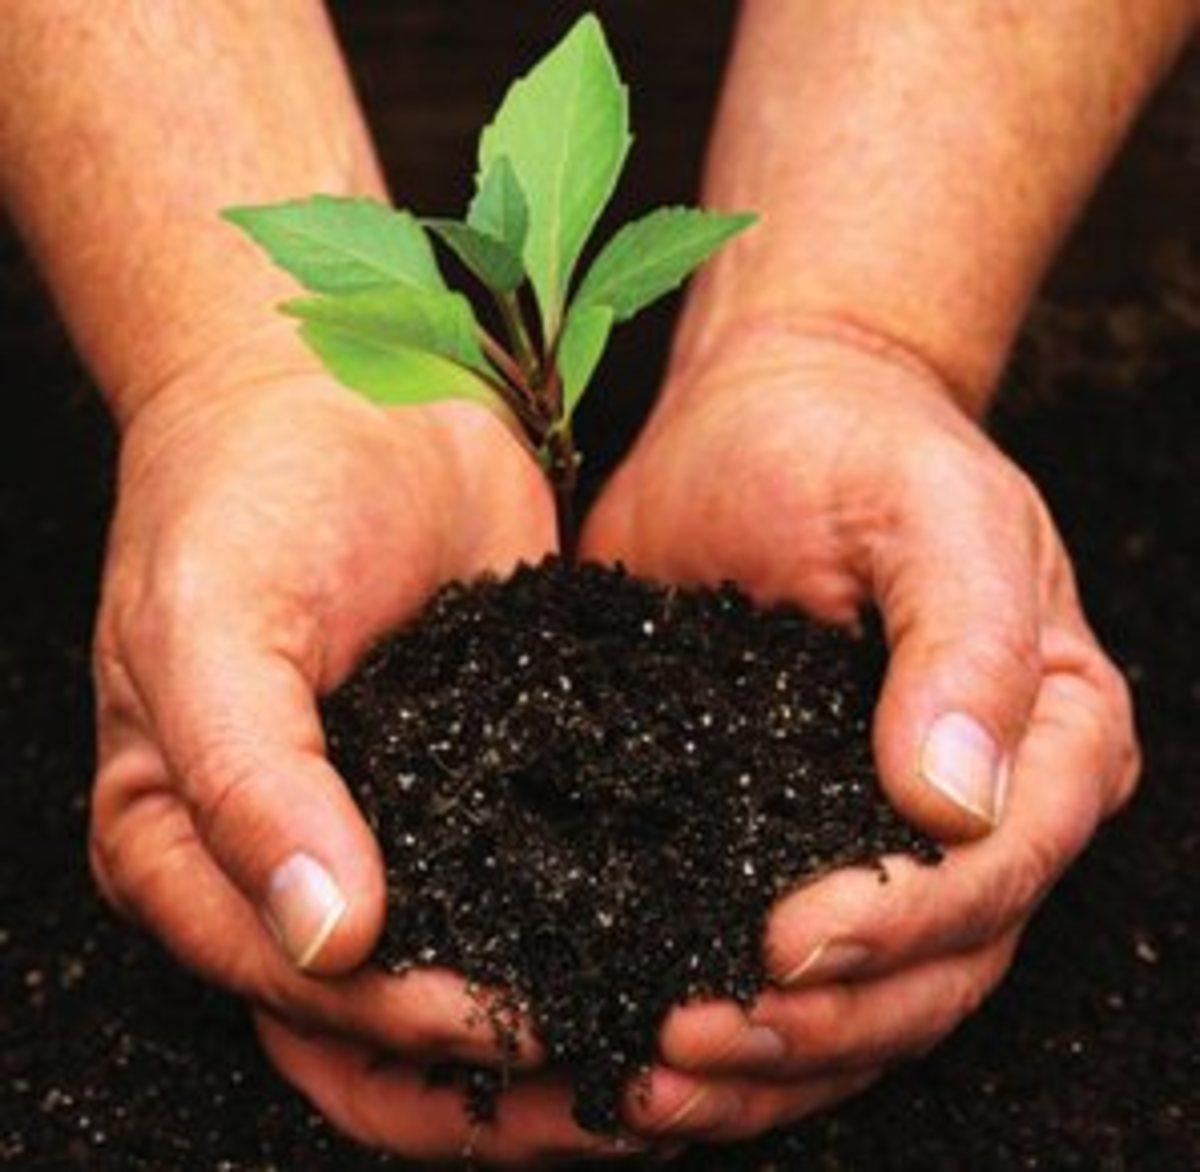 ikea-tree-planting11